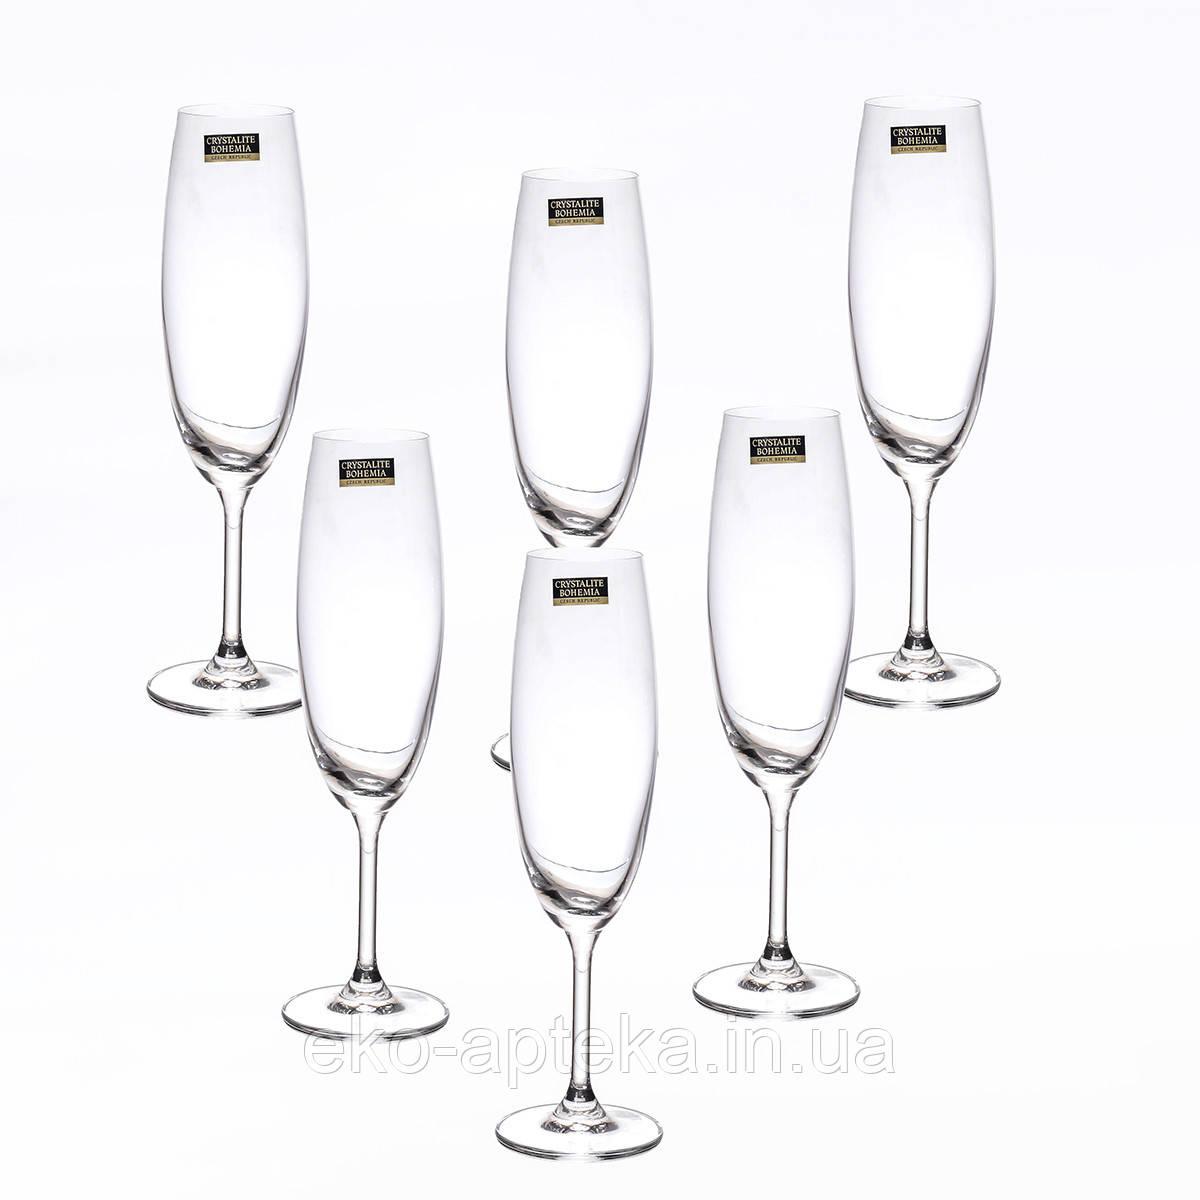 Набор бокалов для шампанского 6ШТ 250МЛ BOHEMIA BARBARA